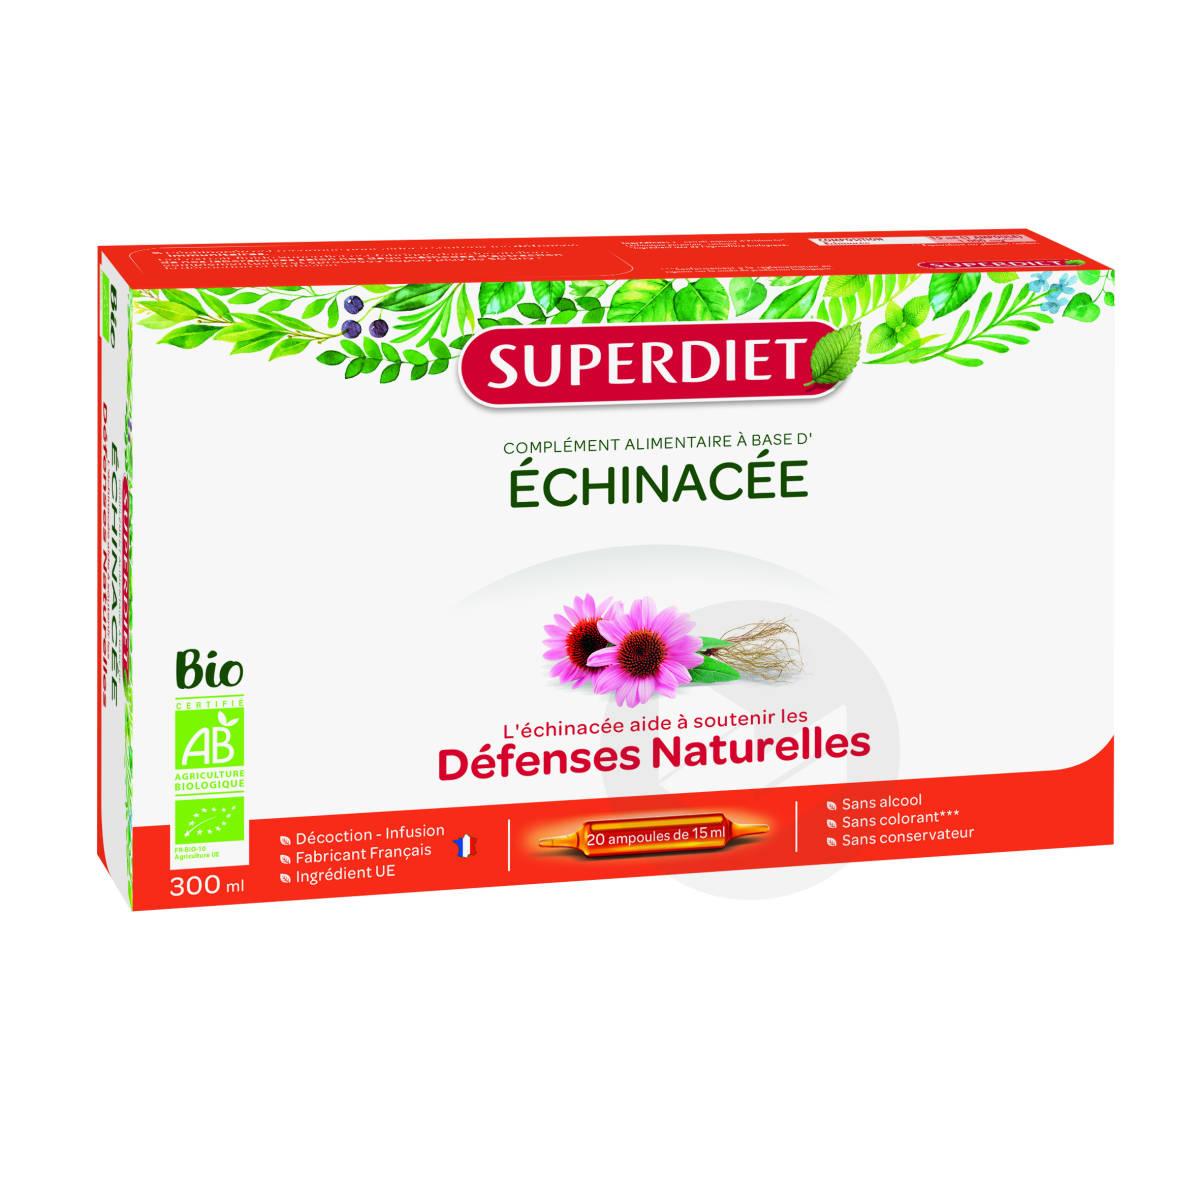 Echinacee Bio 20 Ampoules De 15 Ml